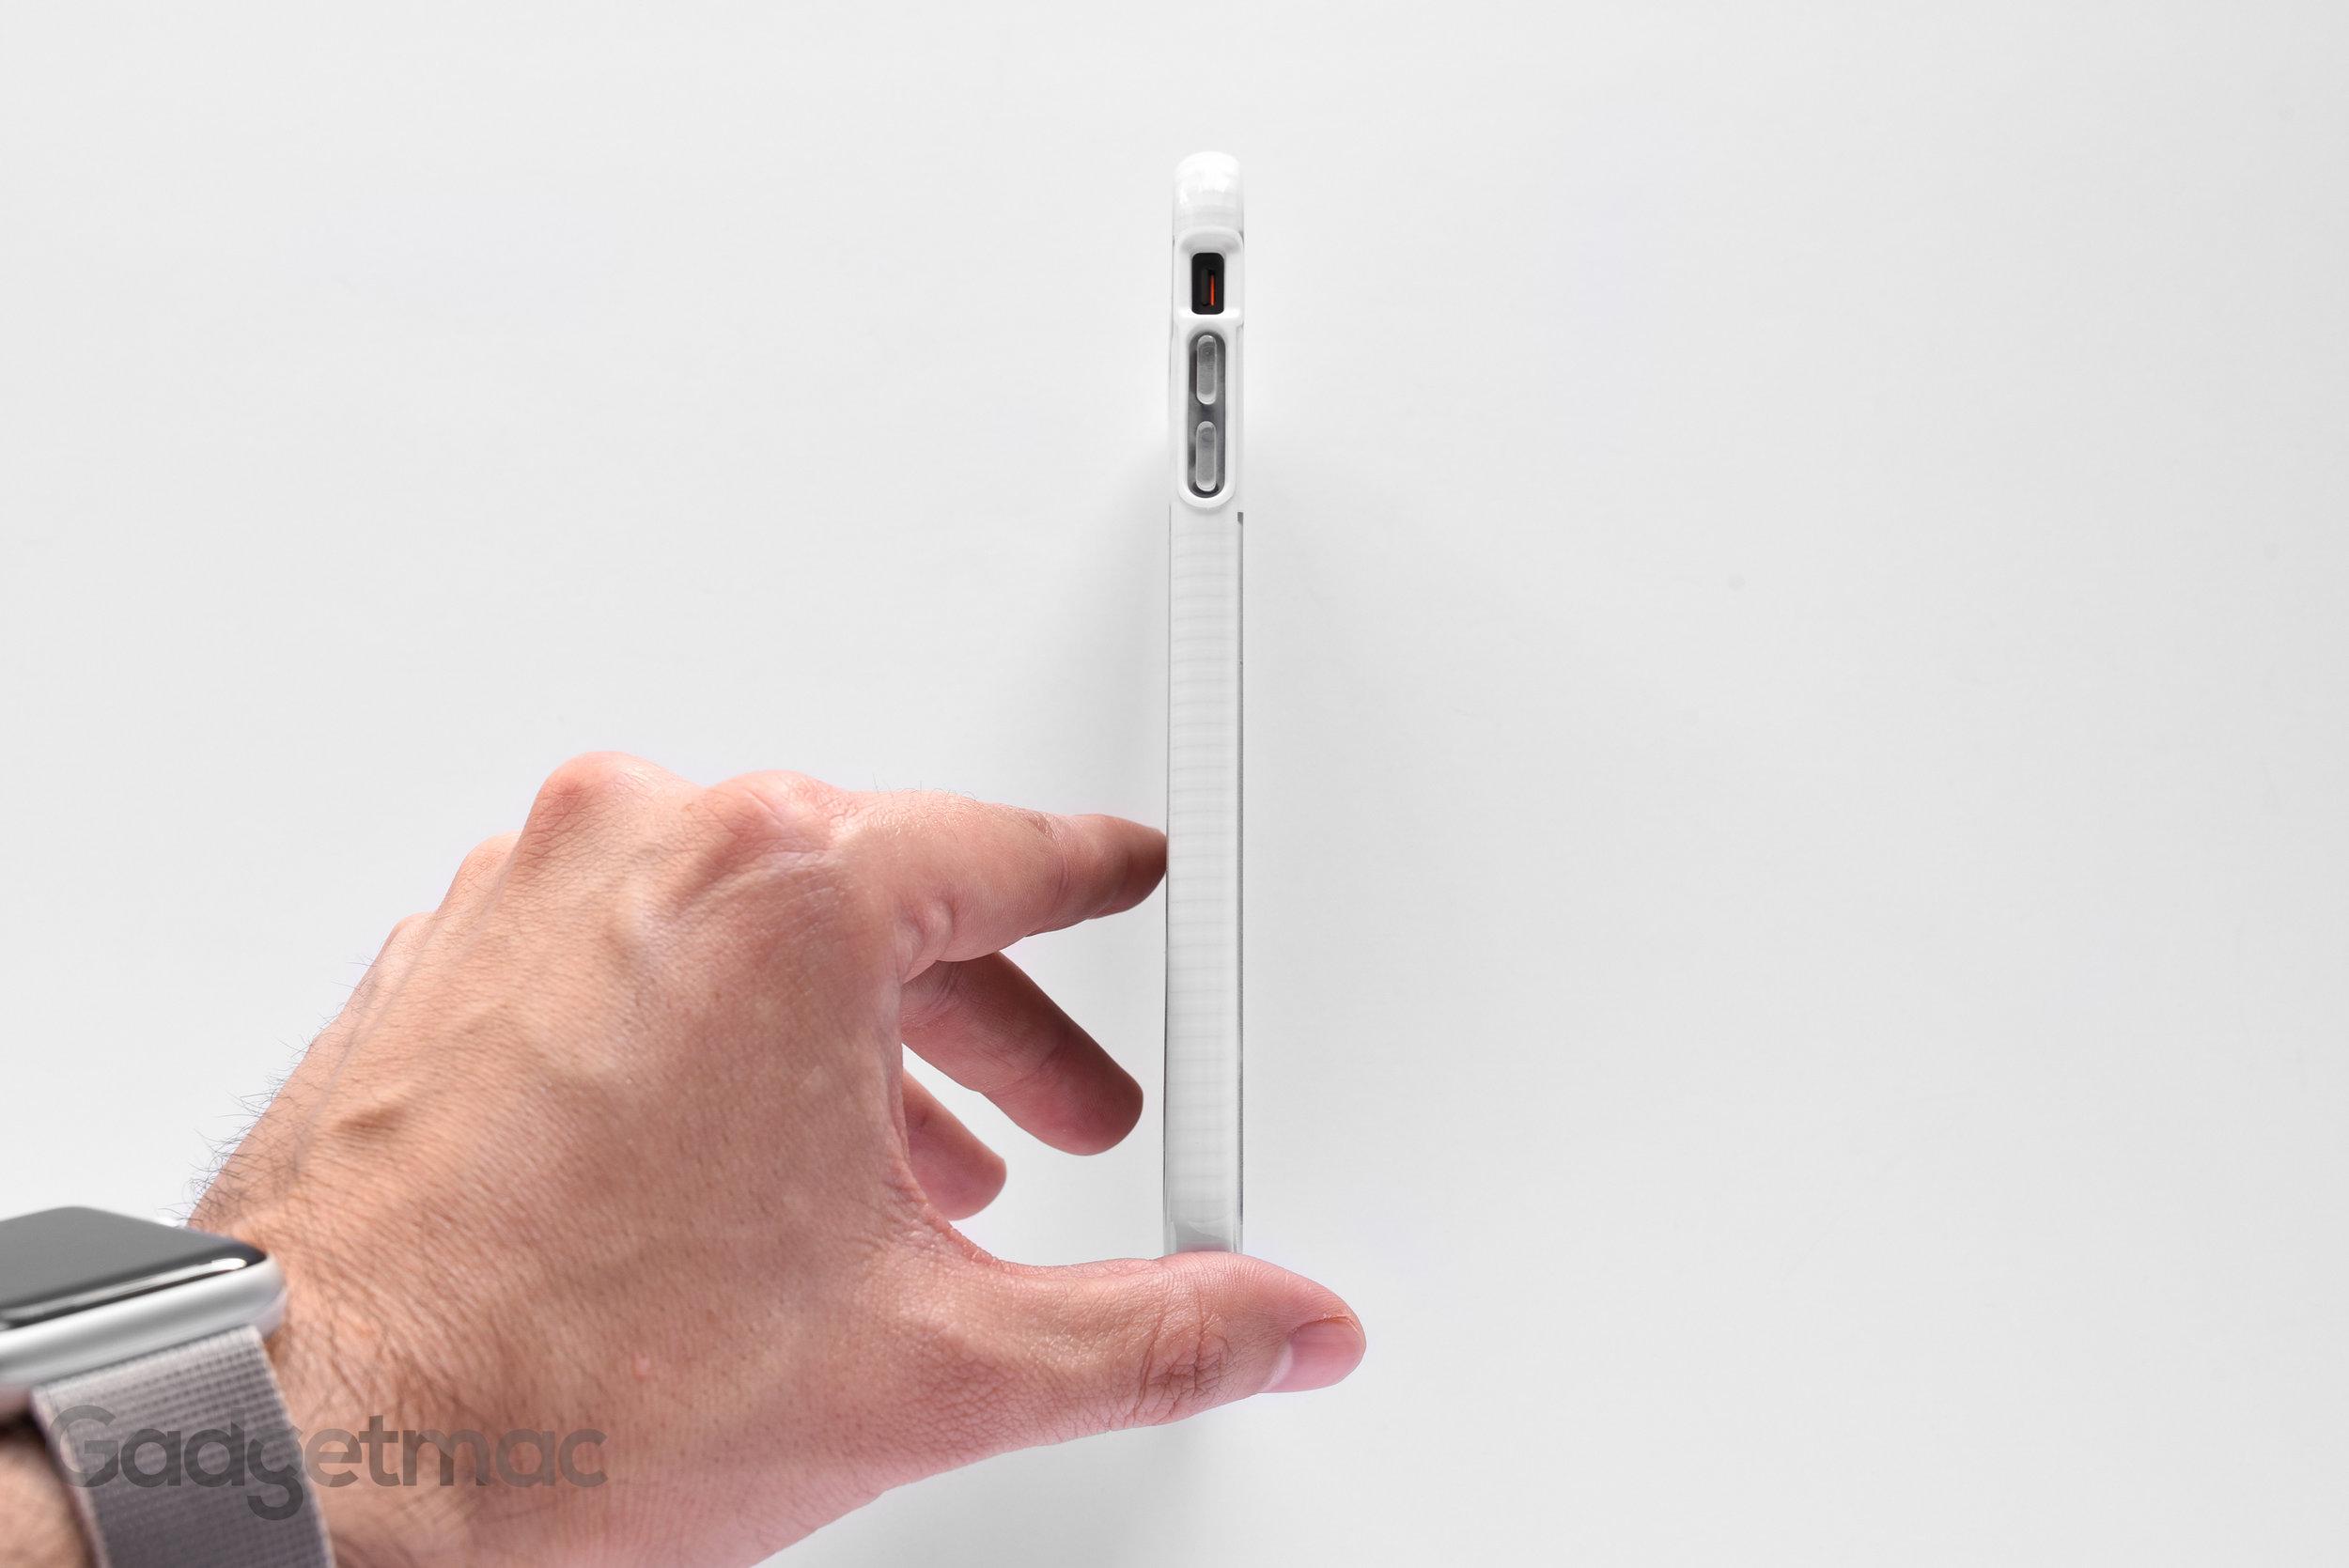 tech21-evo-mesh-slim-iphone-7-plus-case-side.jpg